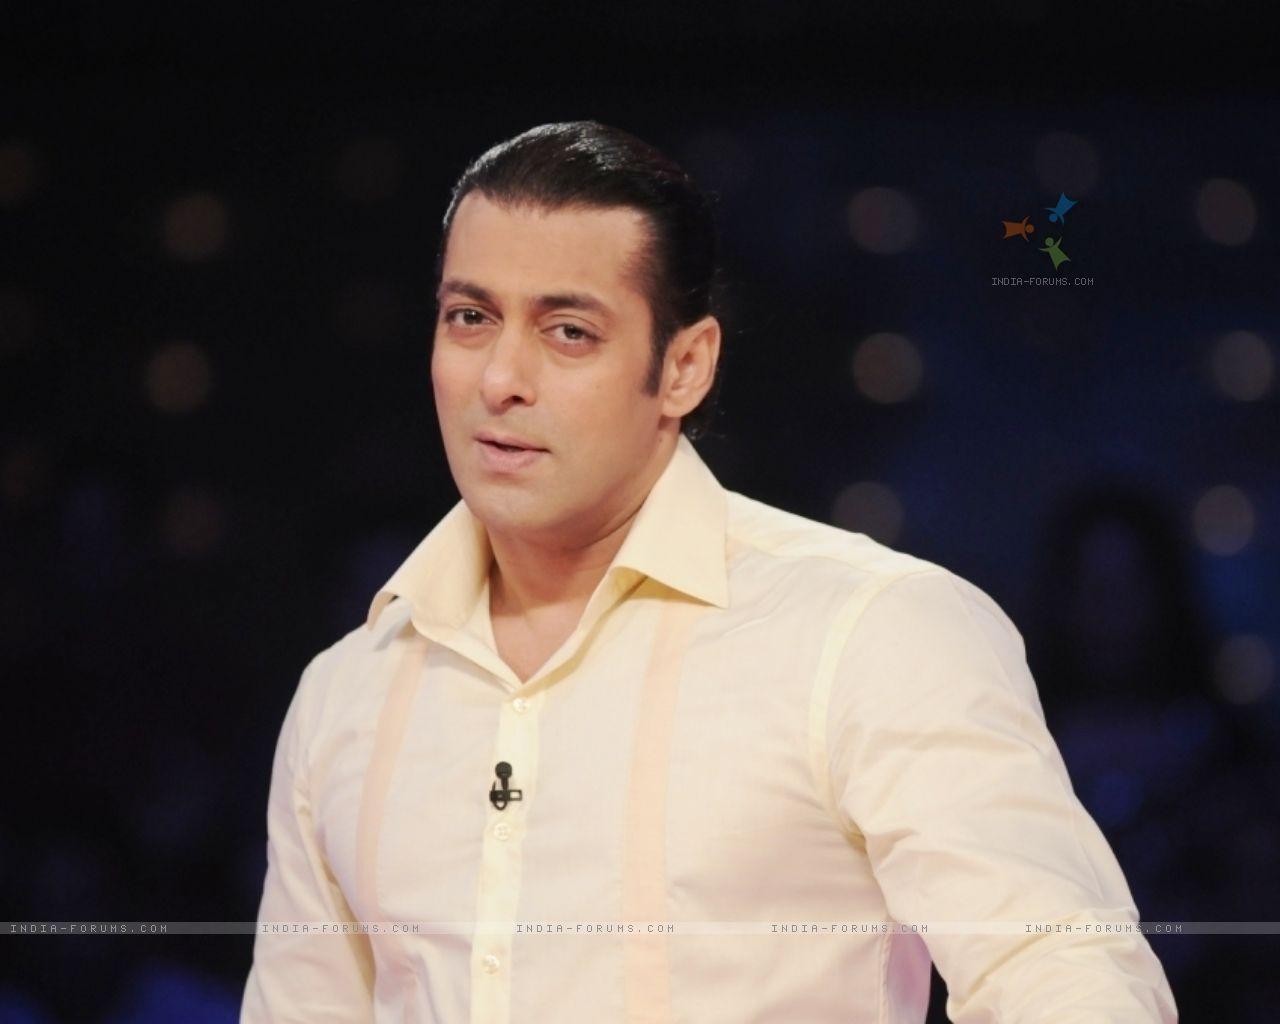 Salman Khan Hot Sexy Video